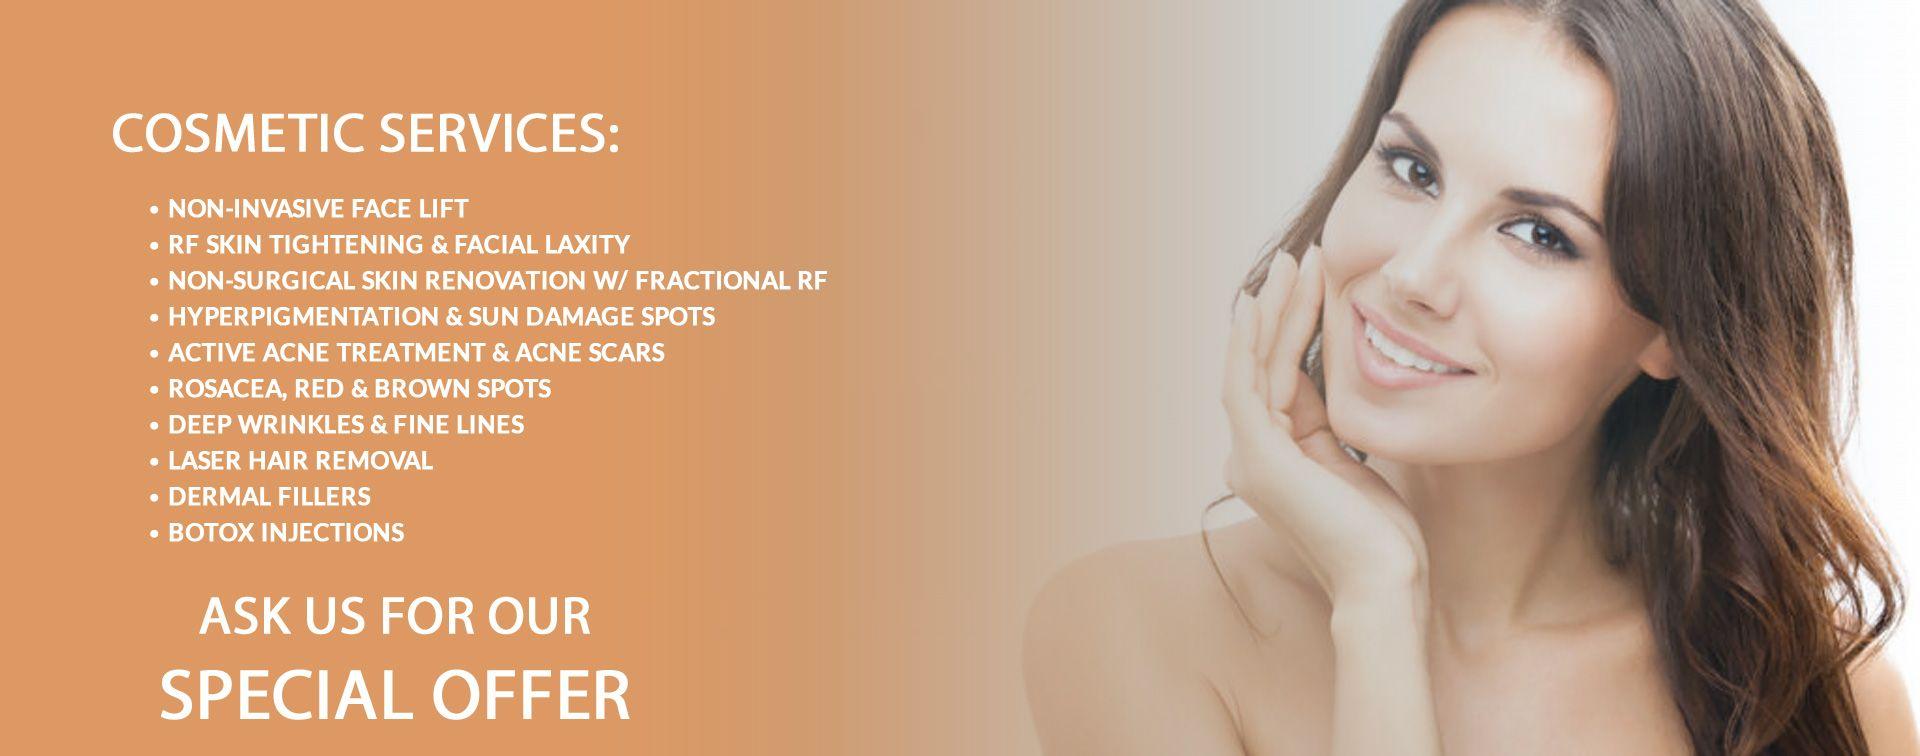 Slider Image 0 Tighten Facial Skin Advanced Skin Care Deep Wrinkles